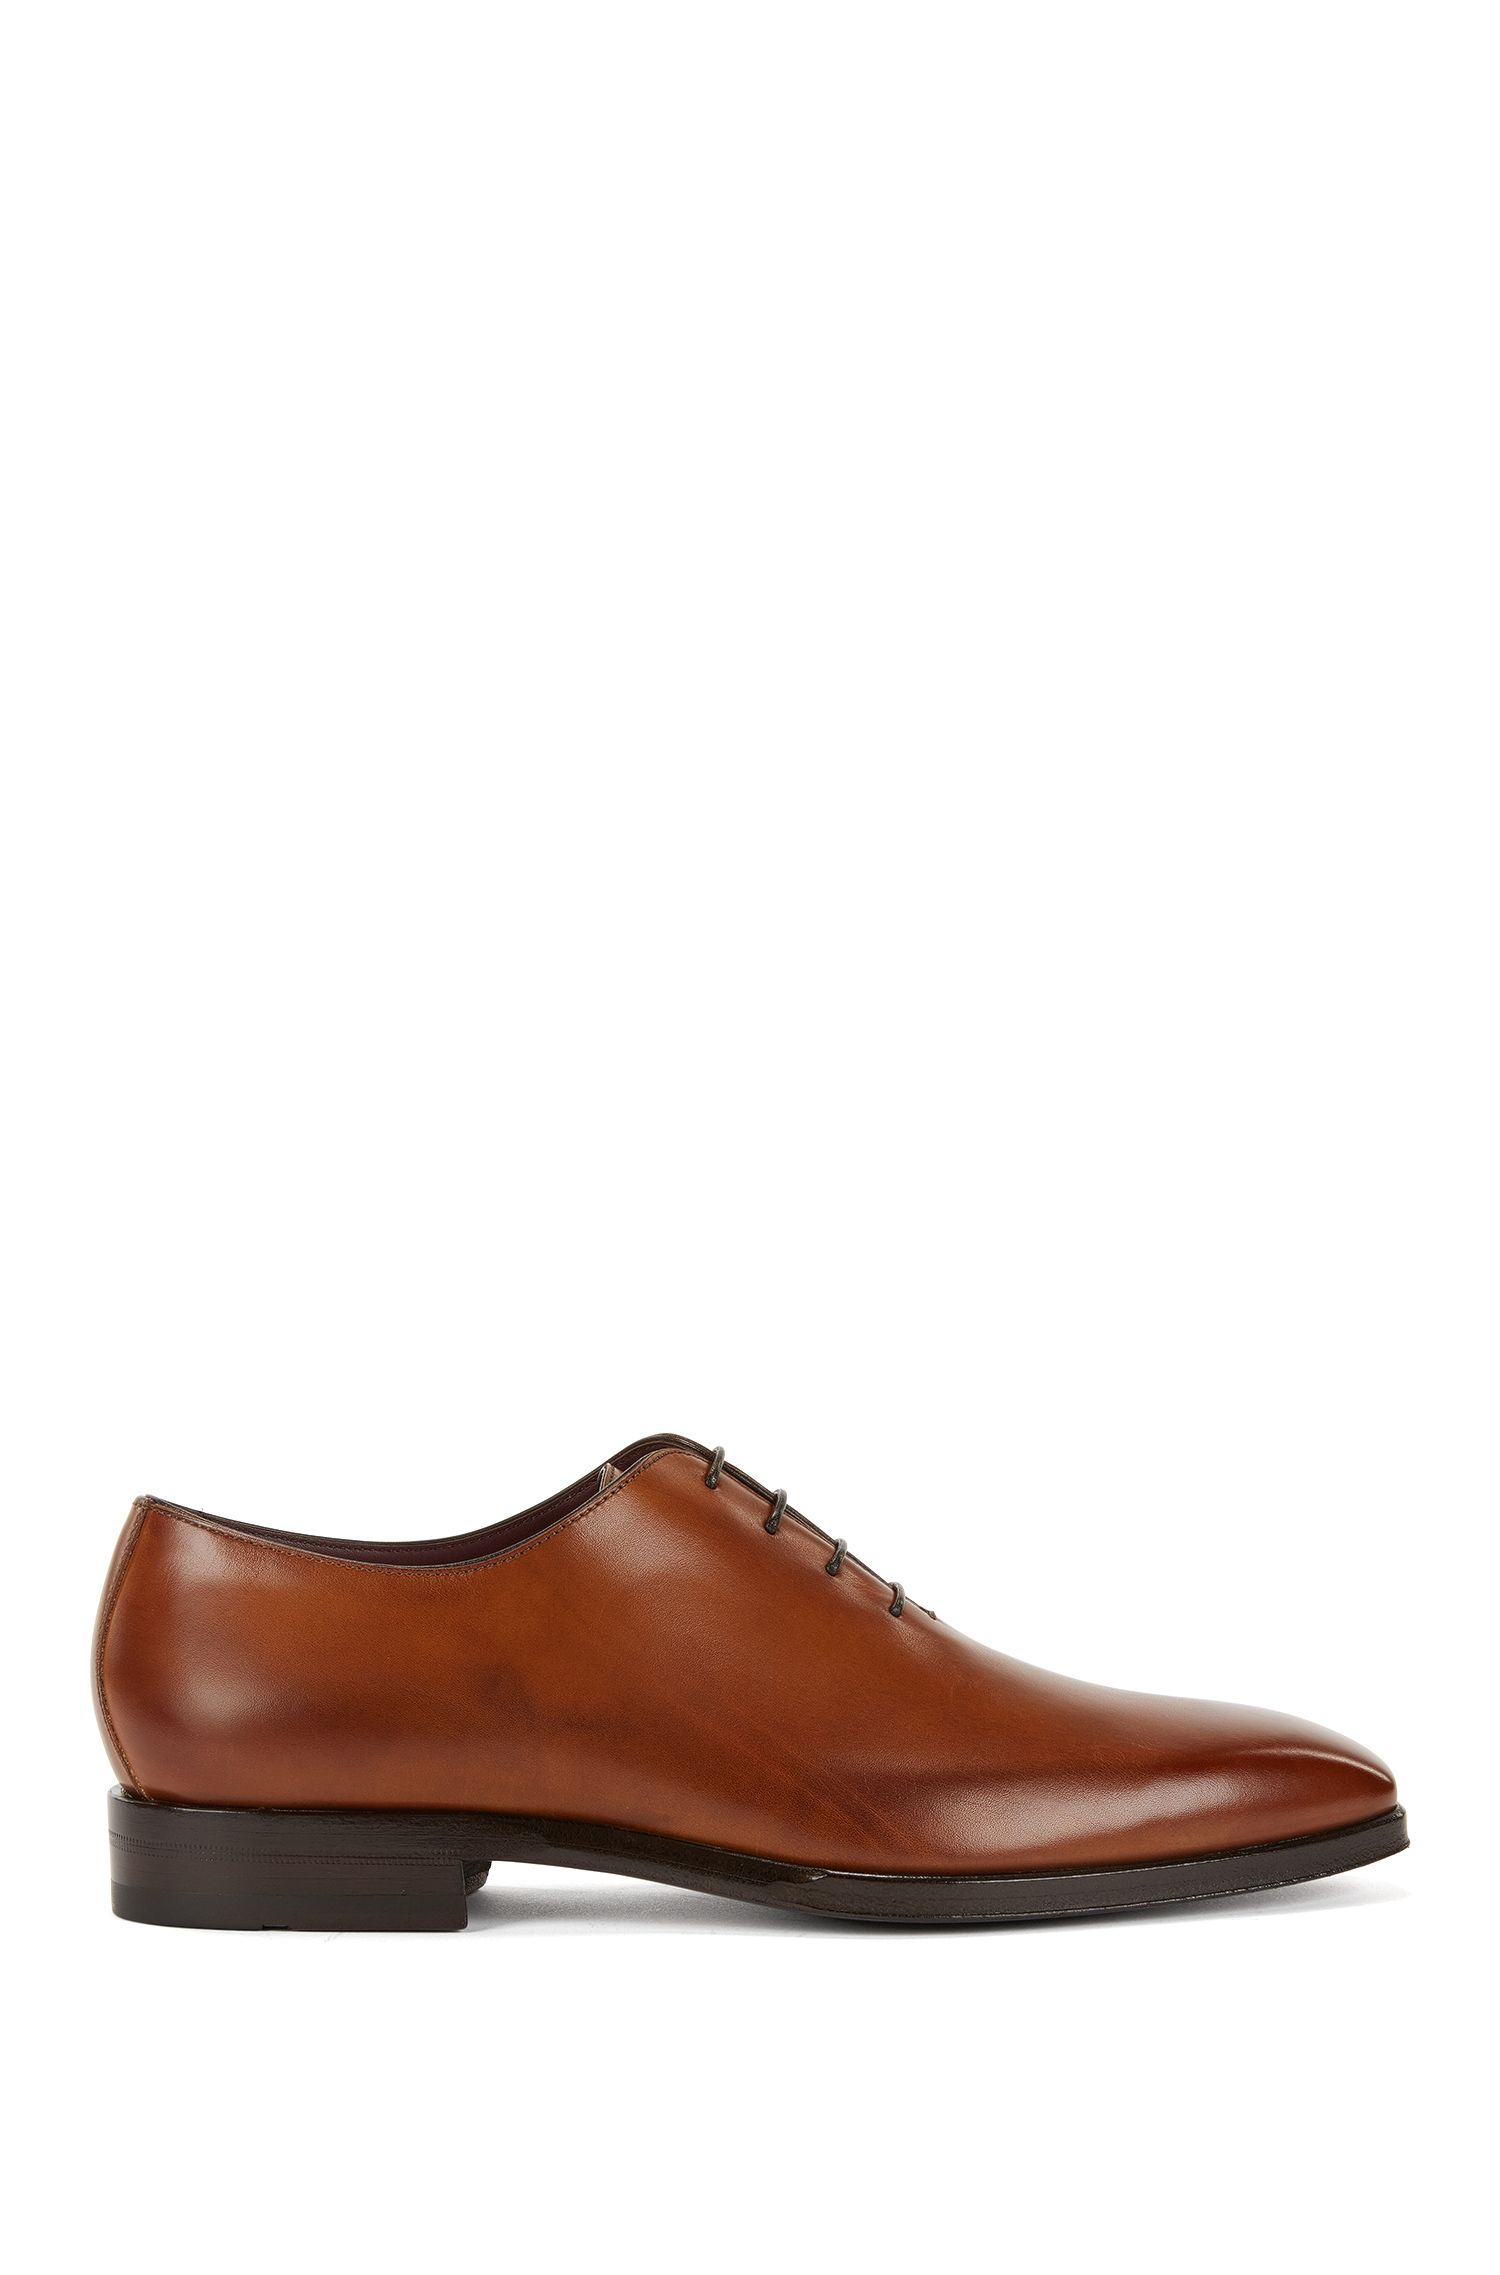 Chaussures Oxford en cuir poli